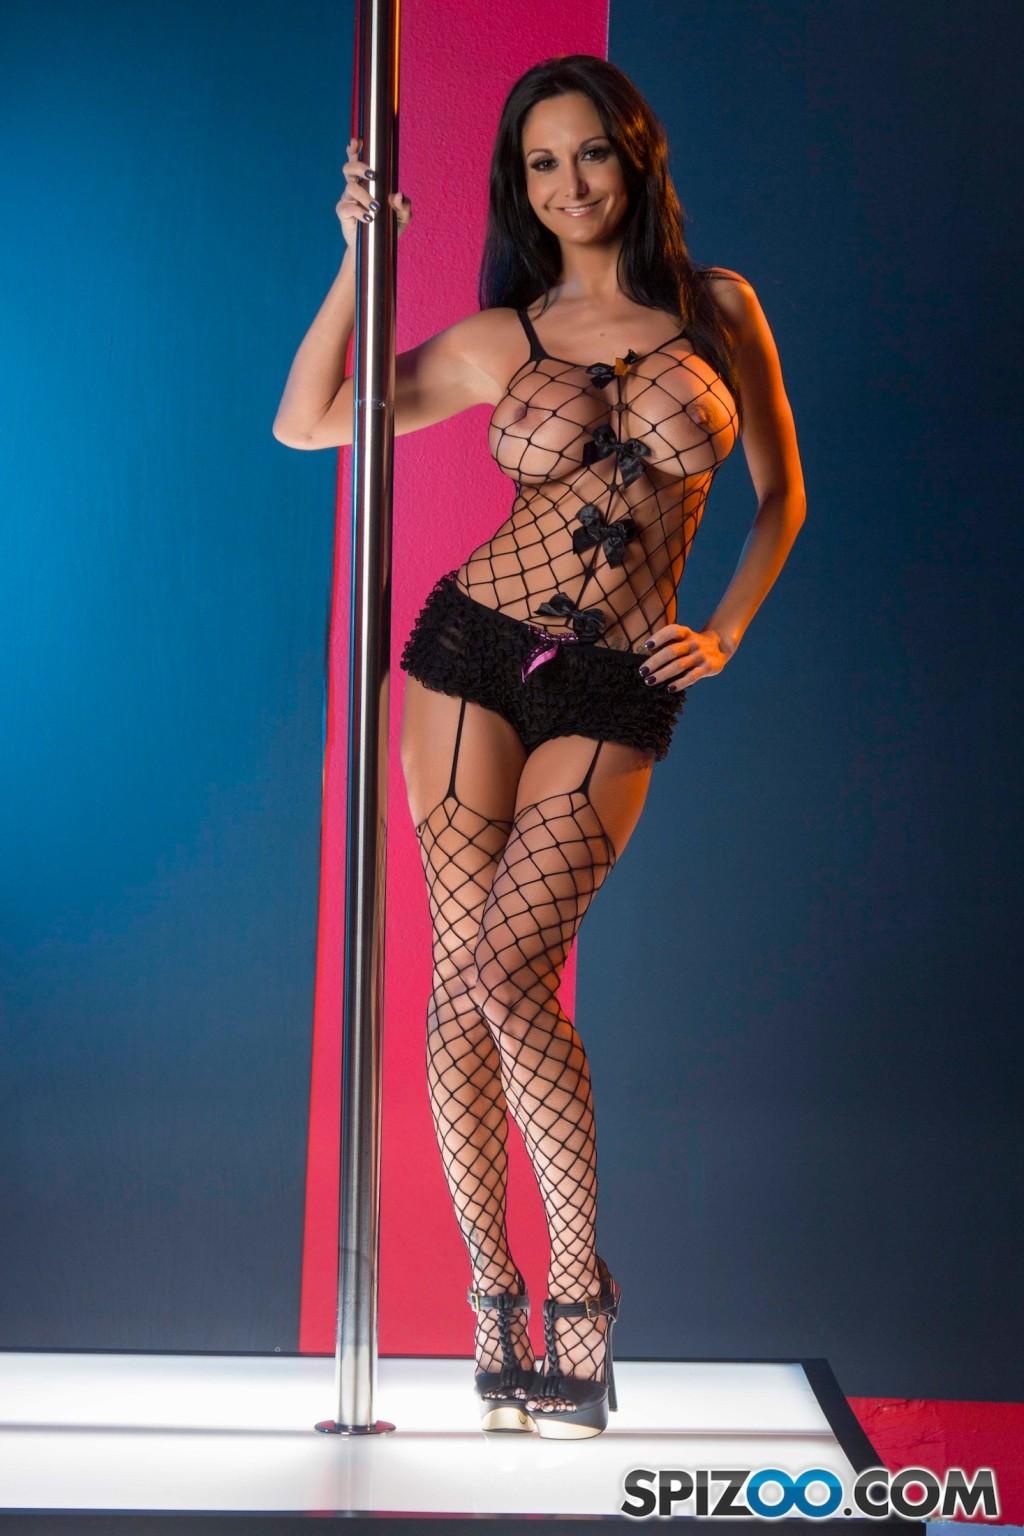 Ava Addams - В клубе - Галерея № 3485456